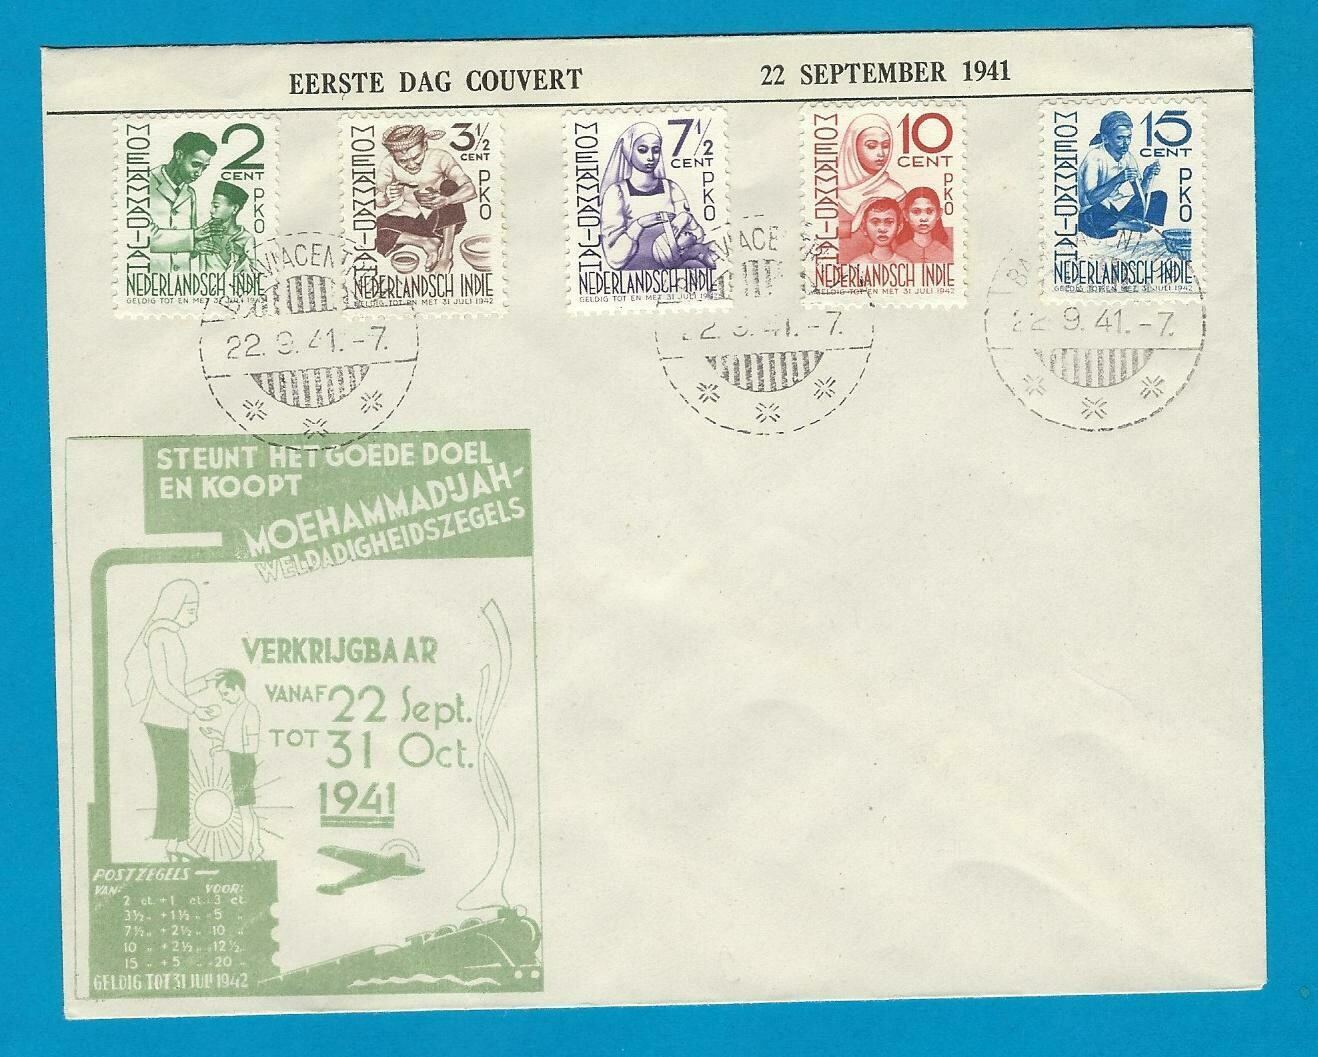 NETHERLANDS EAST INDIES 1941 Moehammadijah FDC